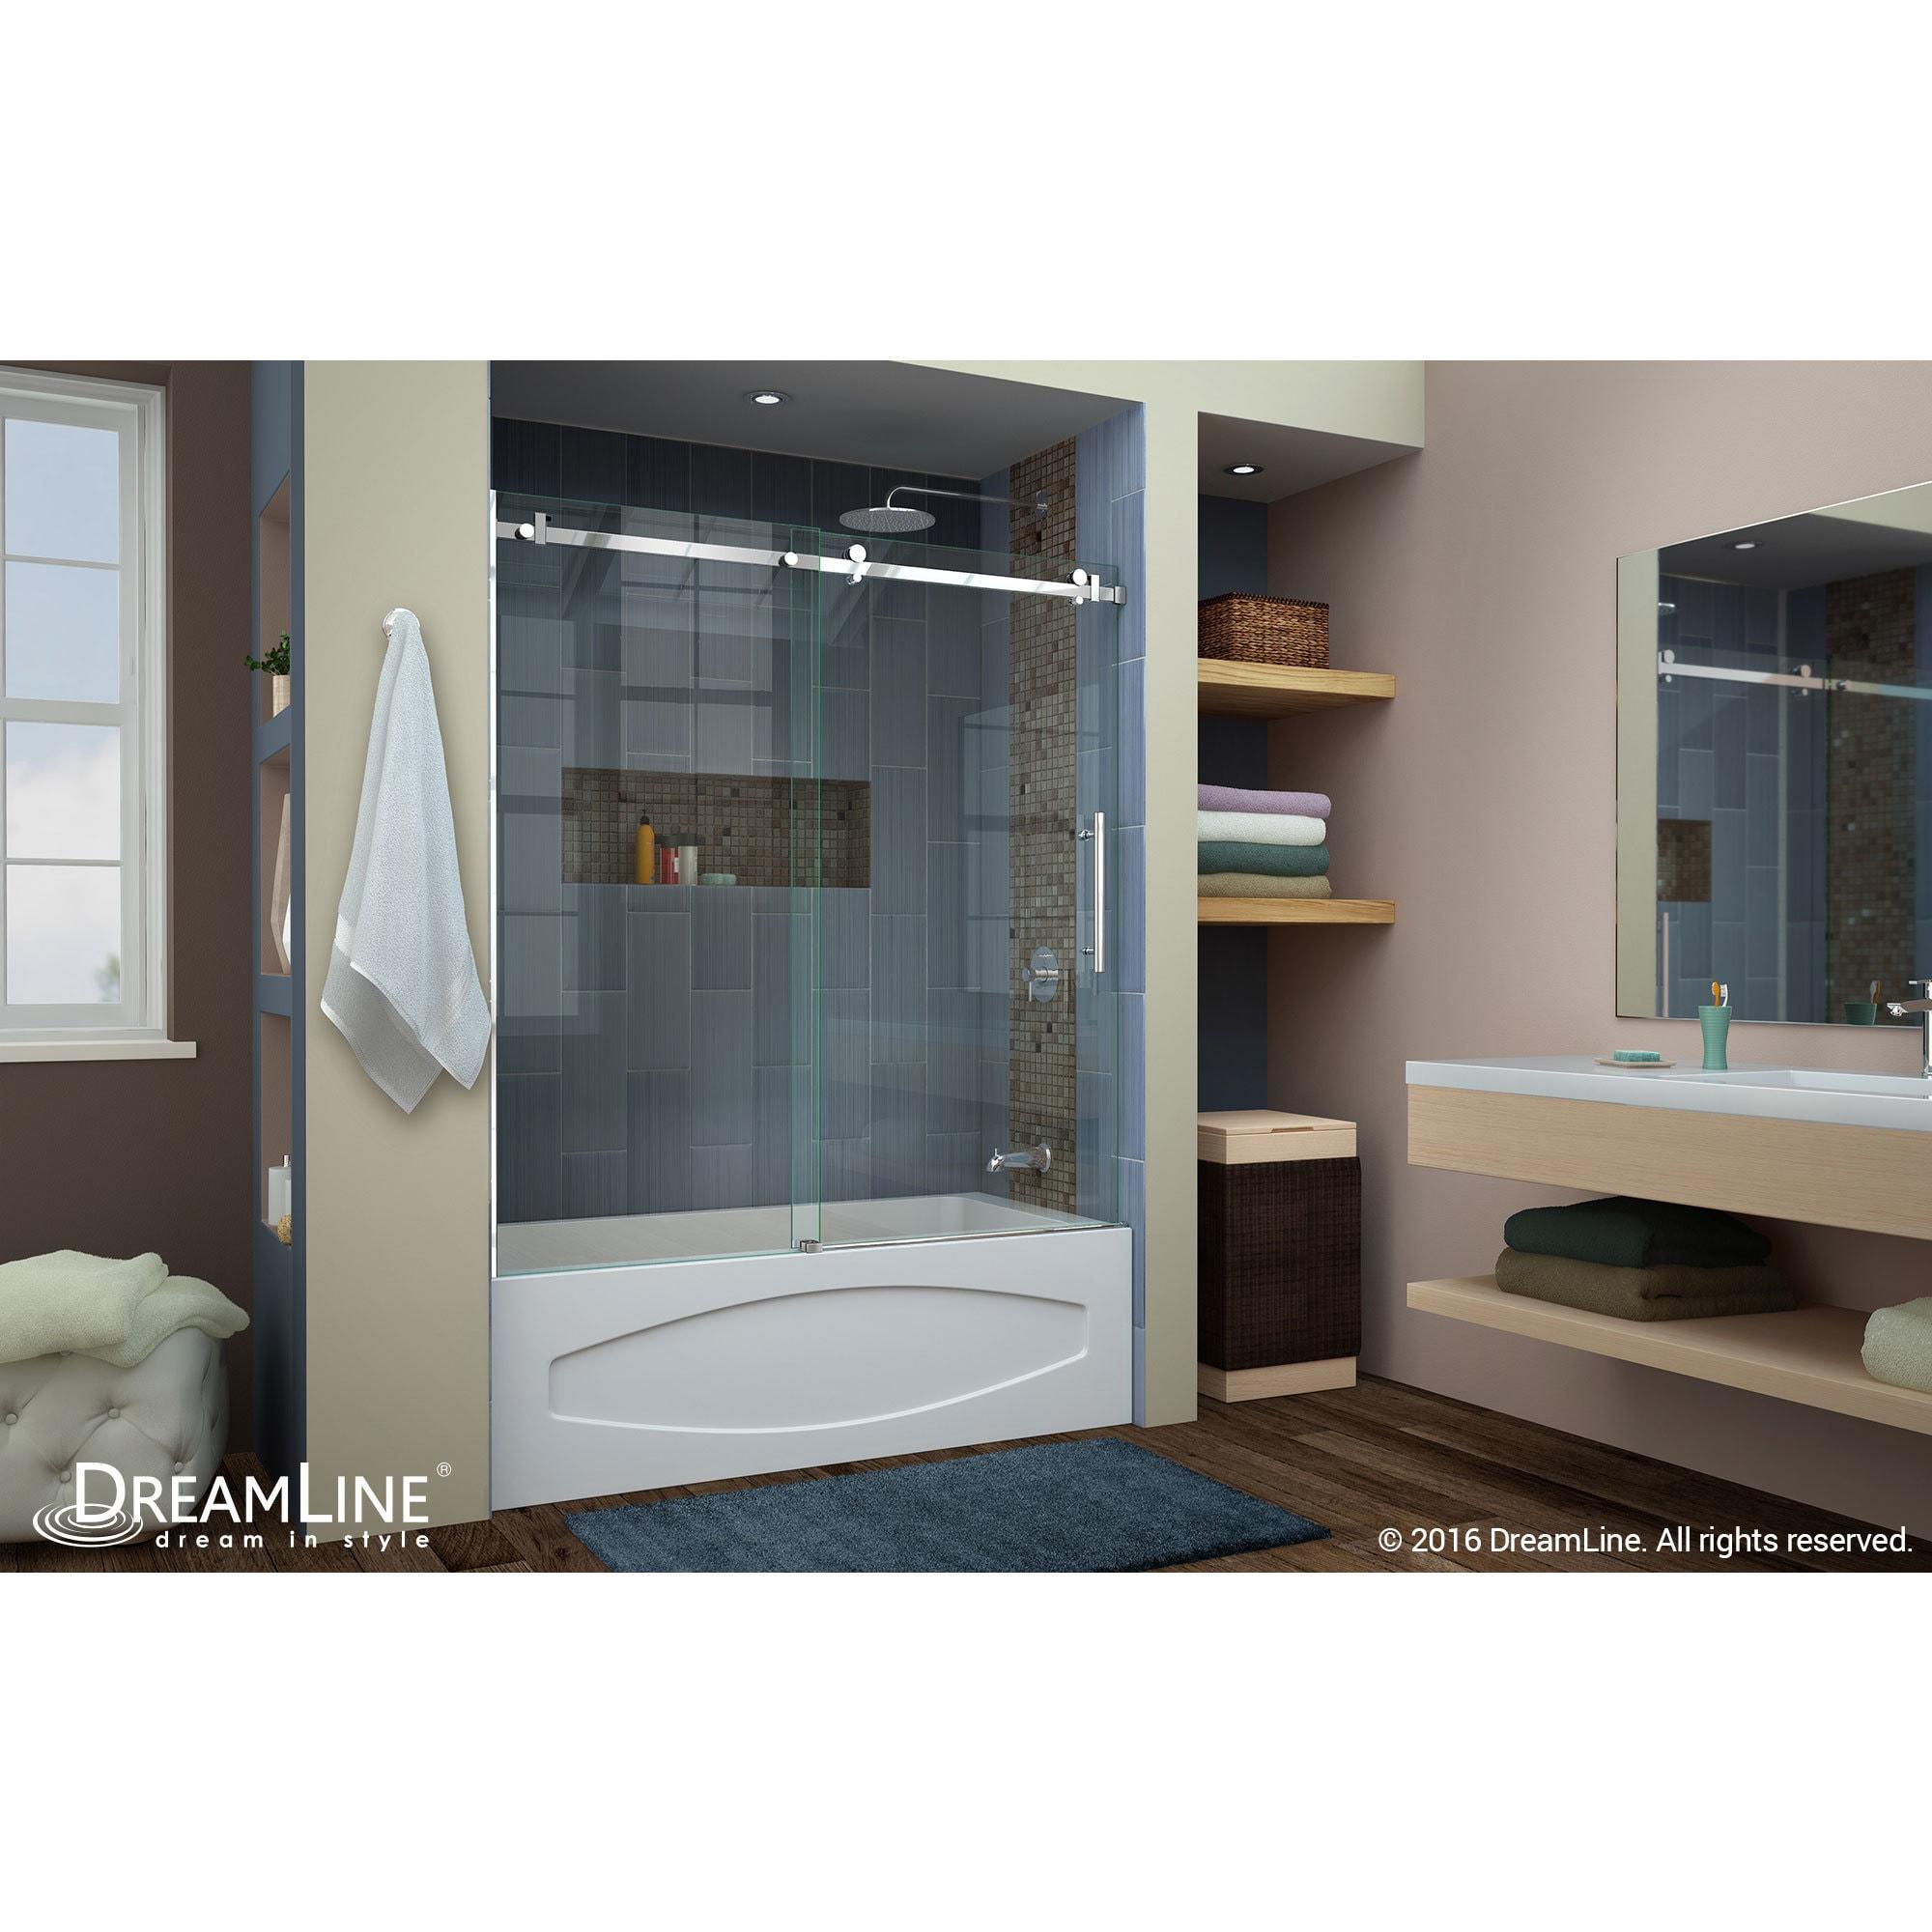 DreamLine Enigma Air 56 to 60 in. Frameless Sliding Tub Door - Free ...